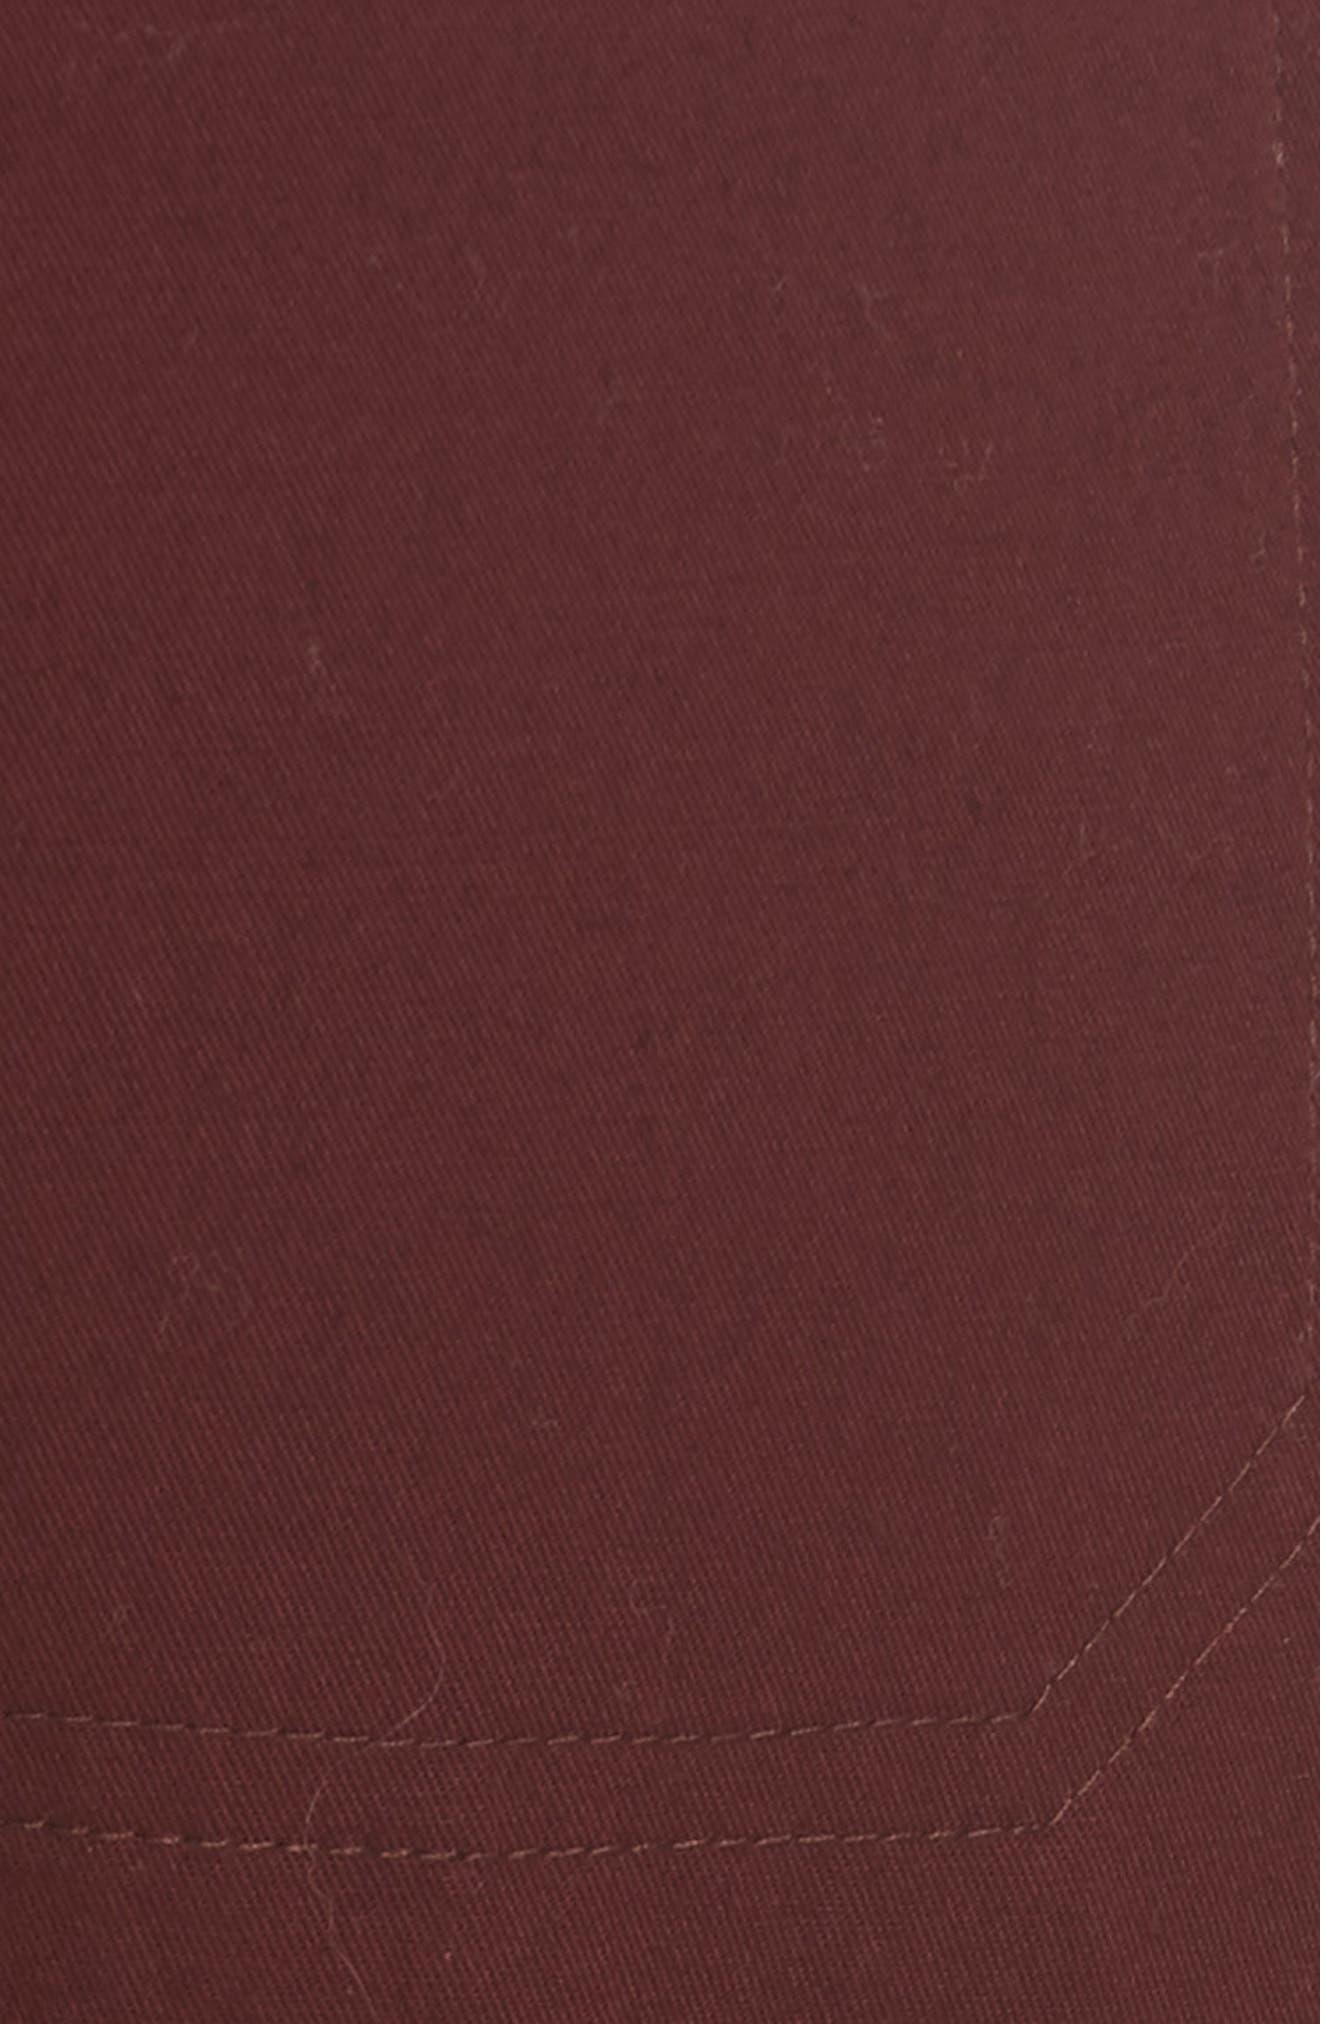 Coin Pocket Chino Pants,                             Alternate thumbnail 5, color,                             BLACK CHERRY